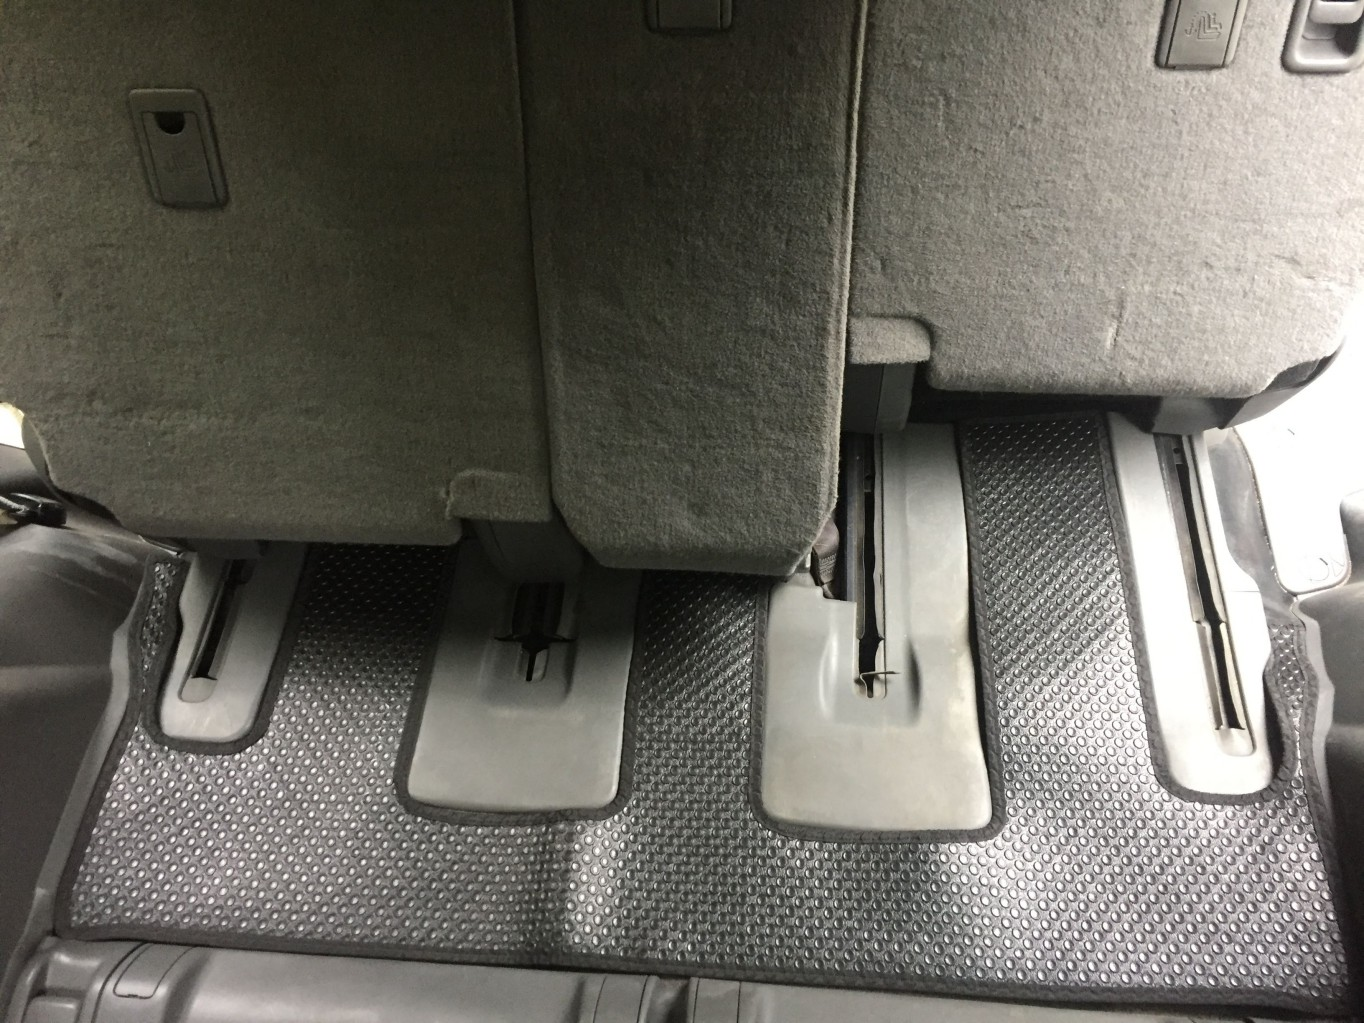 Thảm lót sàn Toyota Prado